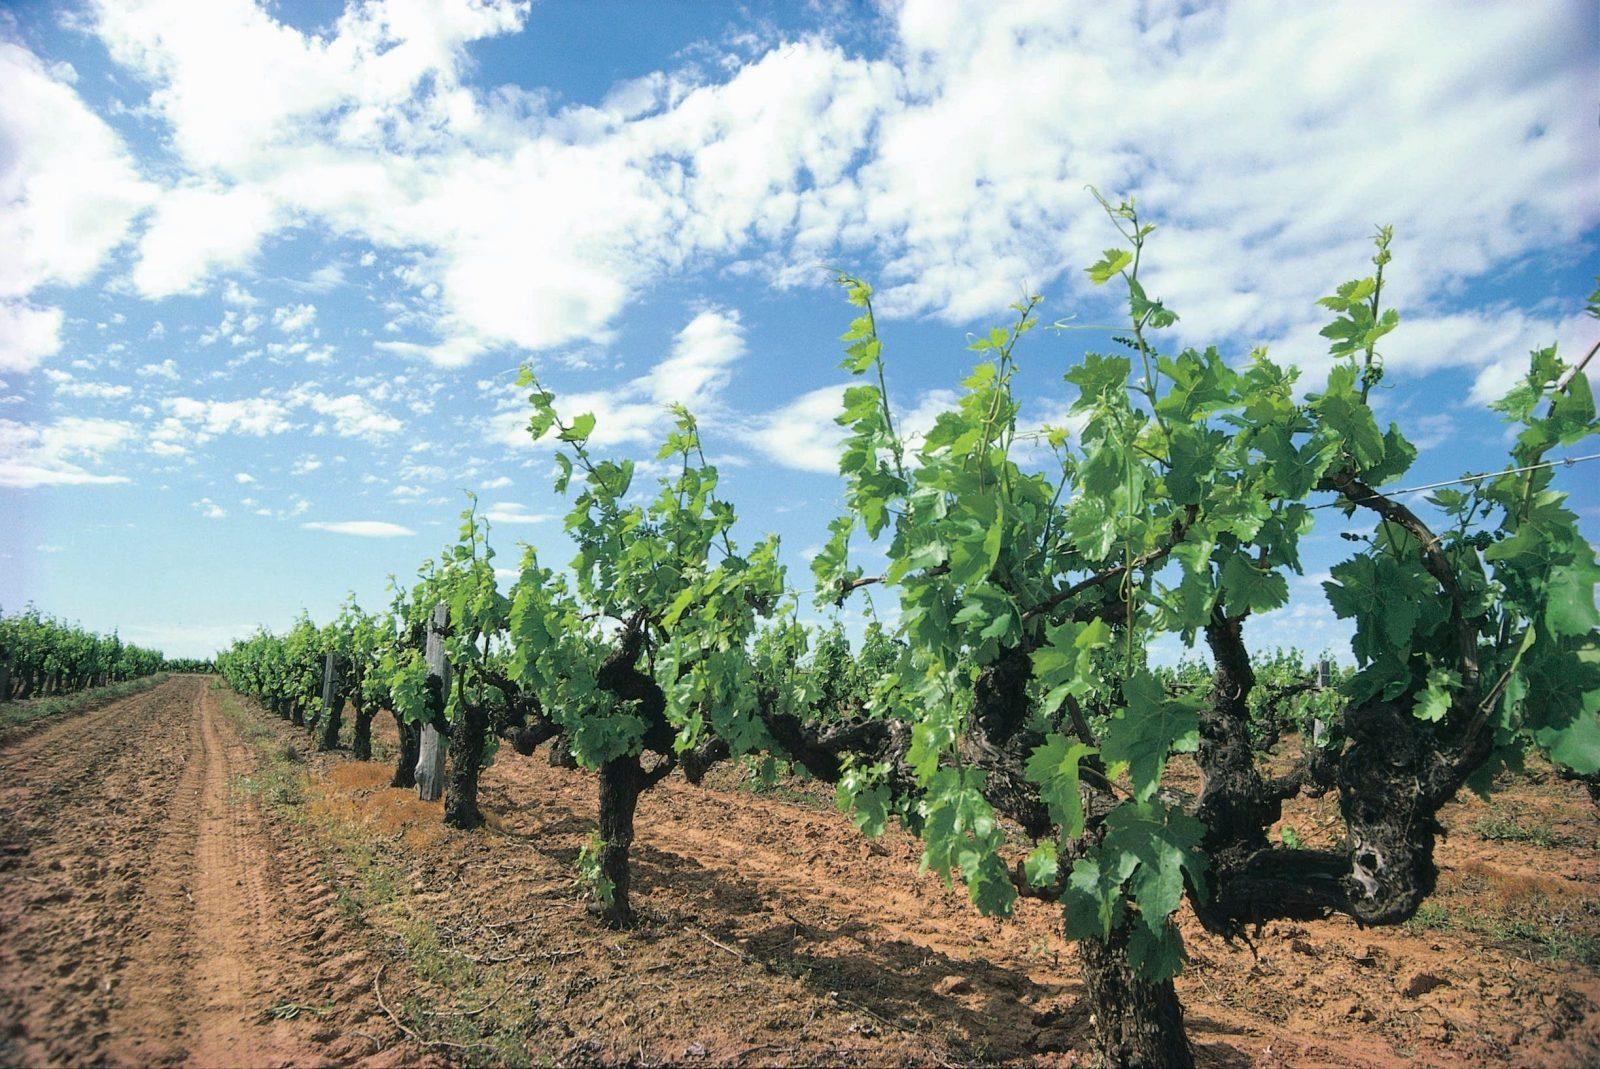 Margaret River Small Family Winery Trail, Margaret River, Western Australia